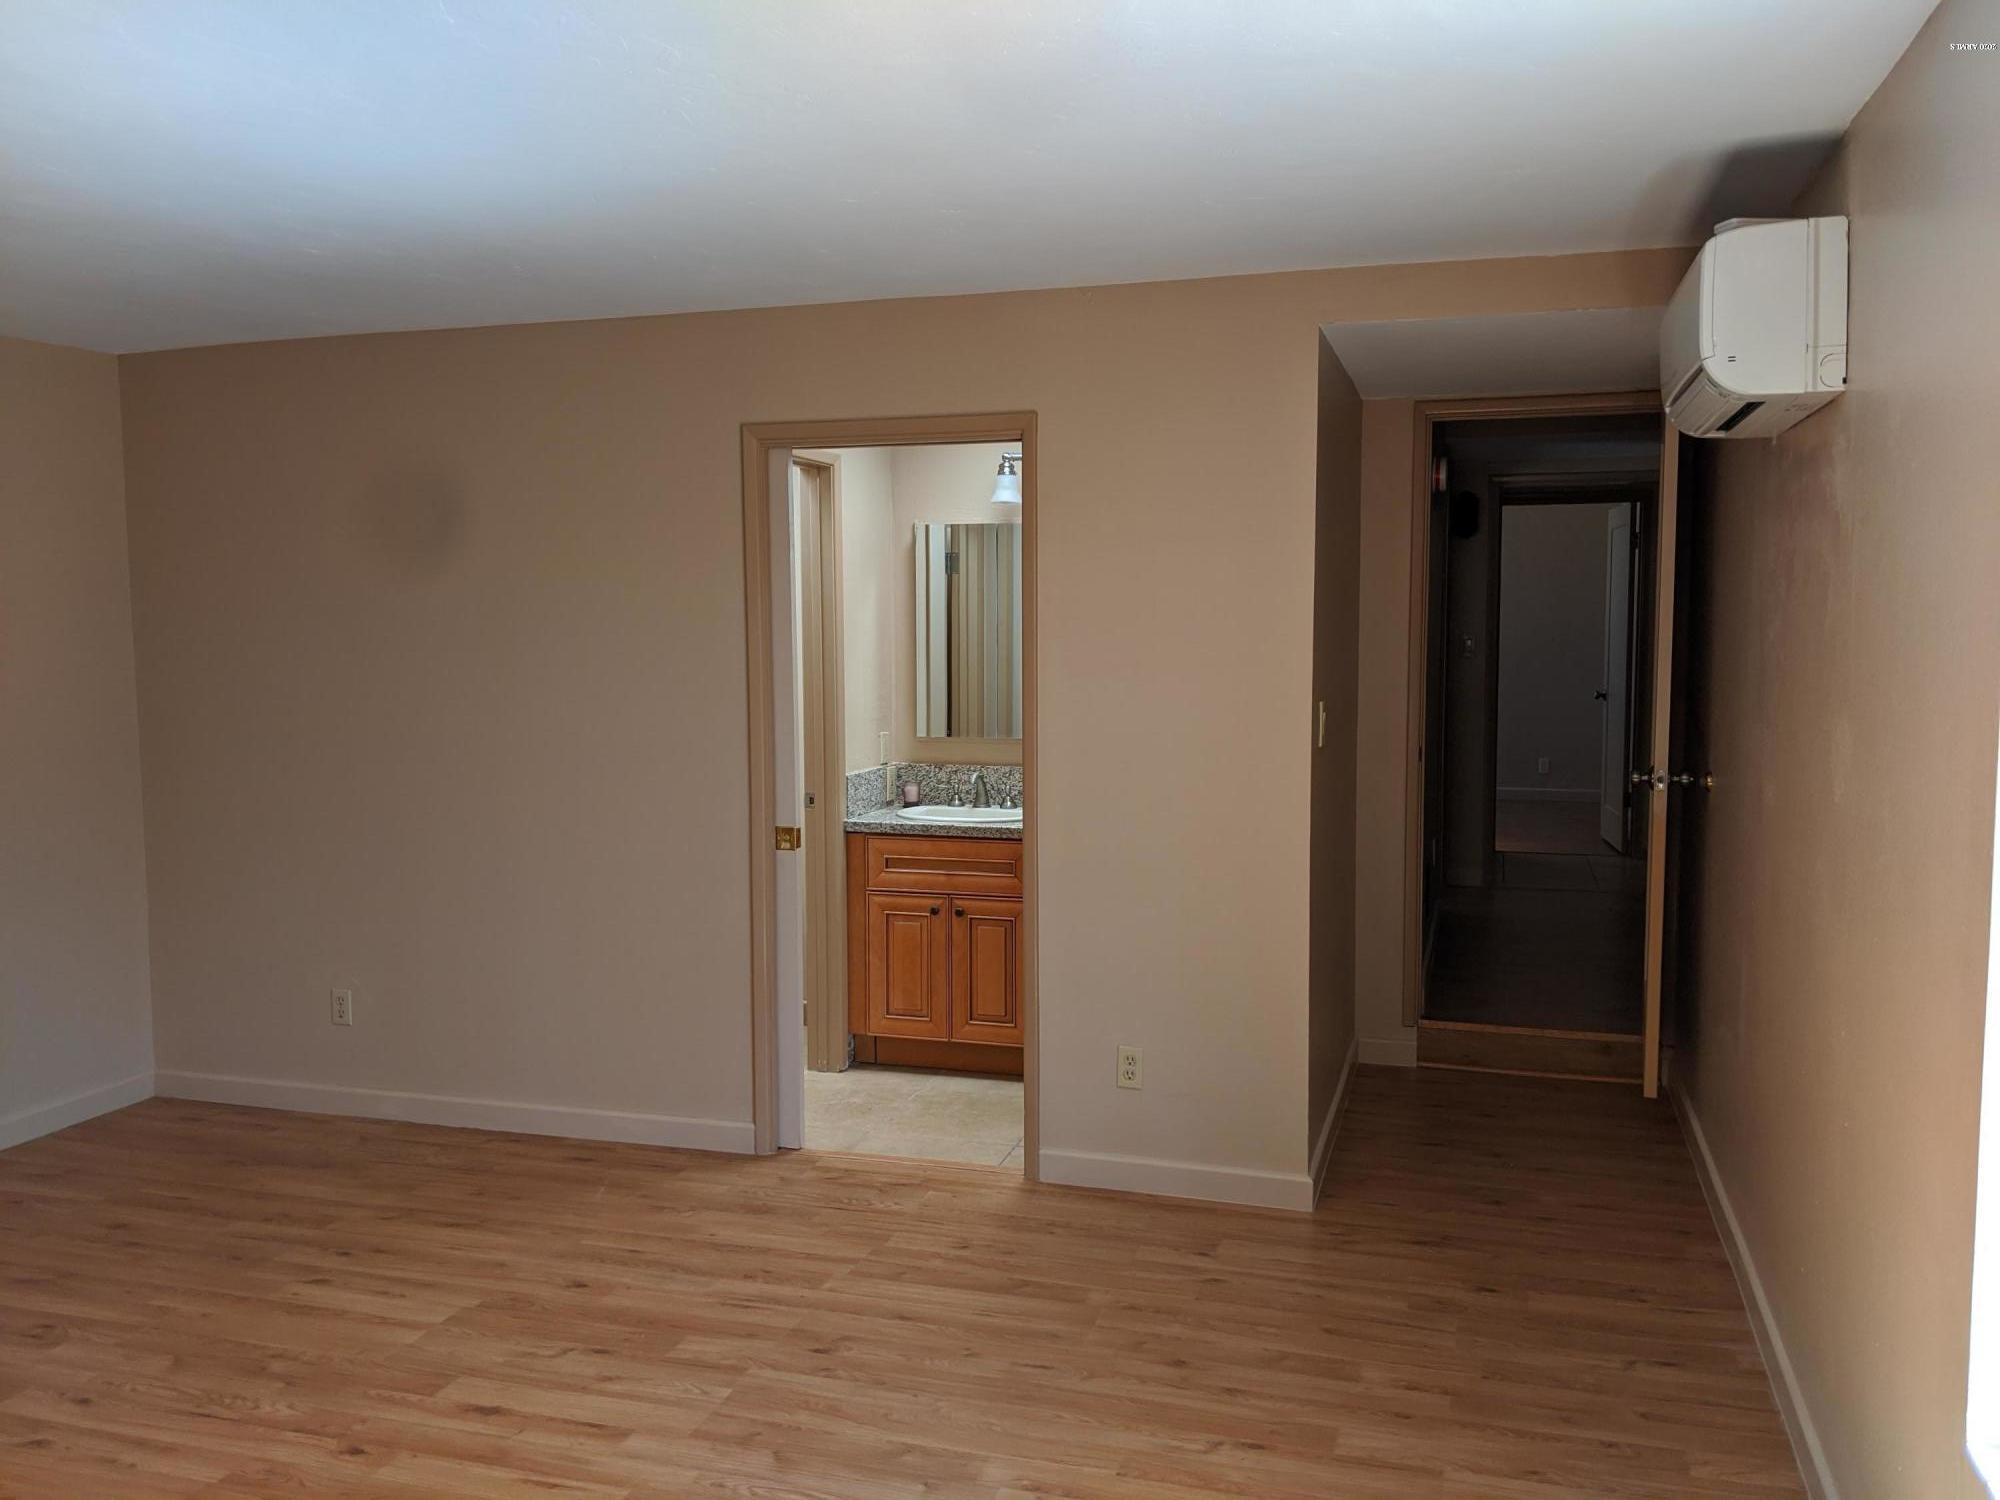 1022 S Eli Drive, Tucson, Arizona 85710, 4 Bedrooms Bedrooms, ,Residential,For Sale,1022 S Eli Drive,6051272